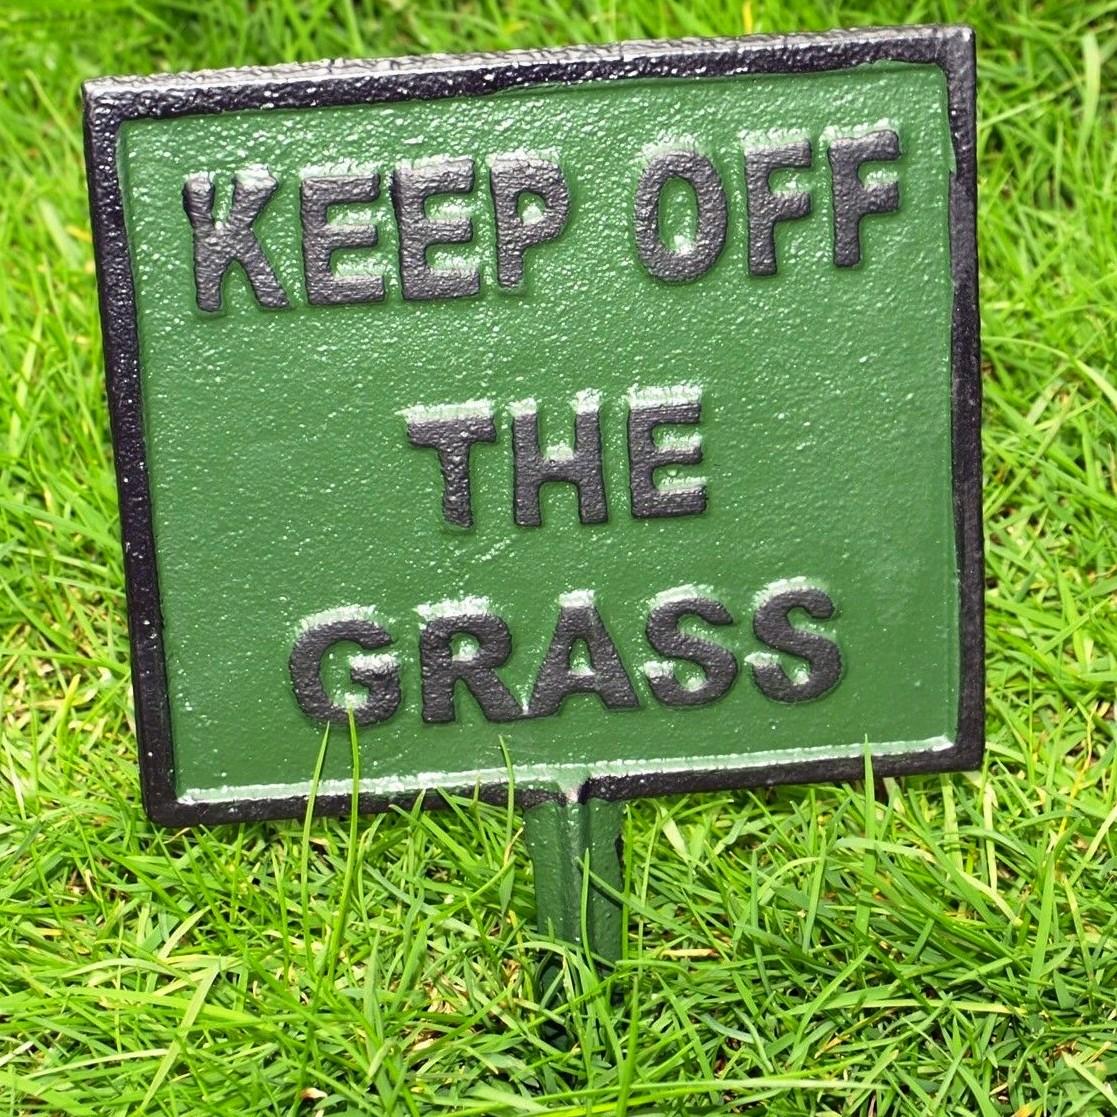 GazonplaatKeep off the grass